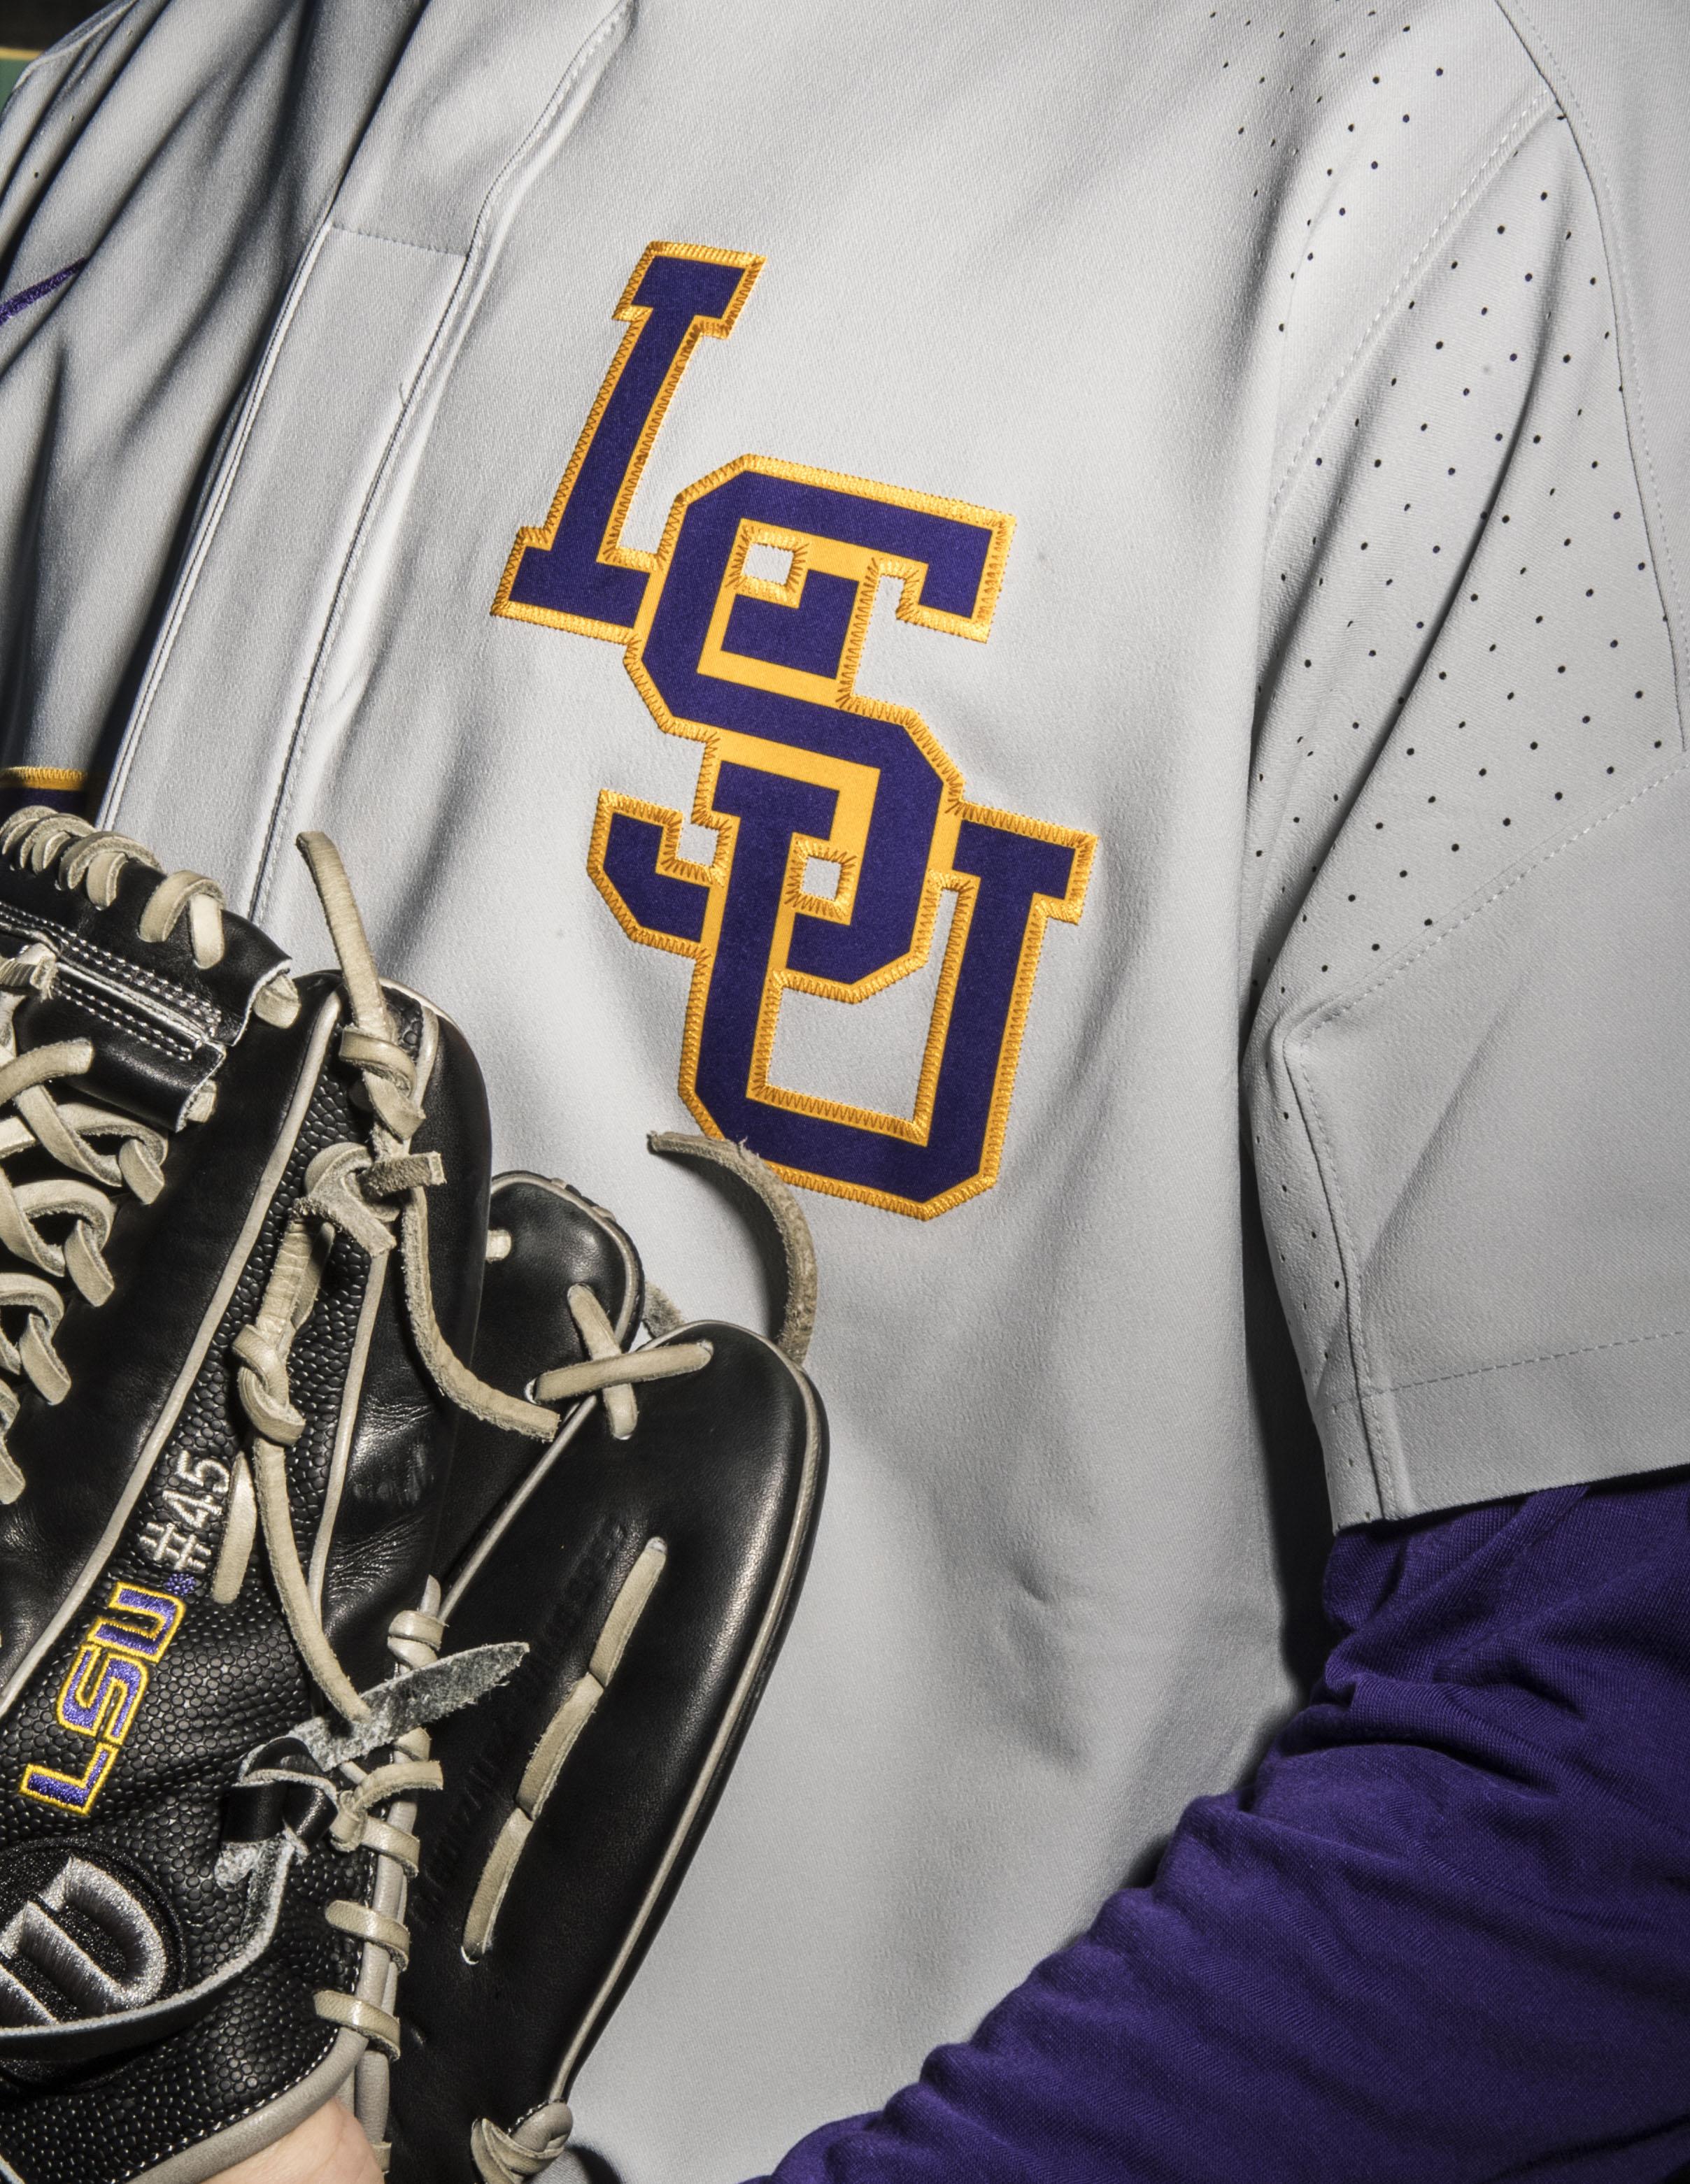 big sale fafa2 c58a6 The Uniforms of LSU Baseball by LSU Athletics - LSU ...